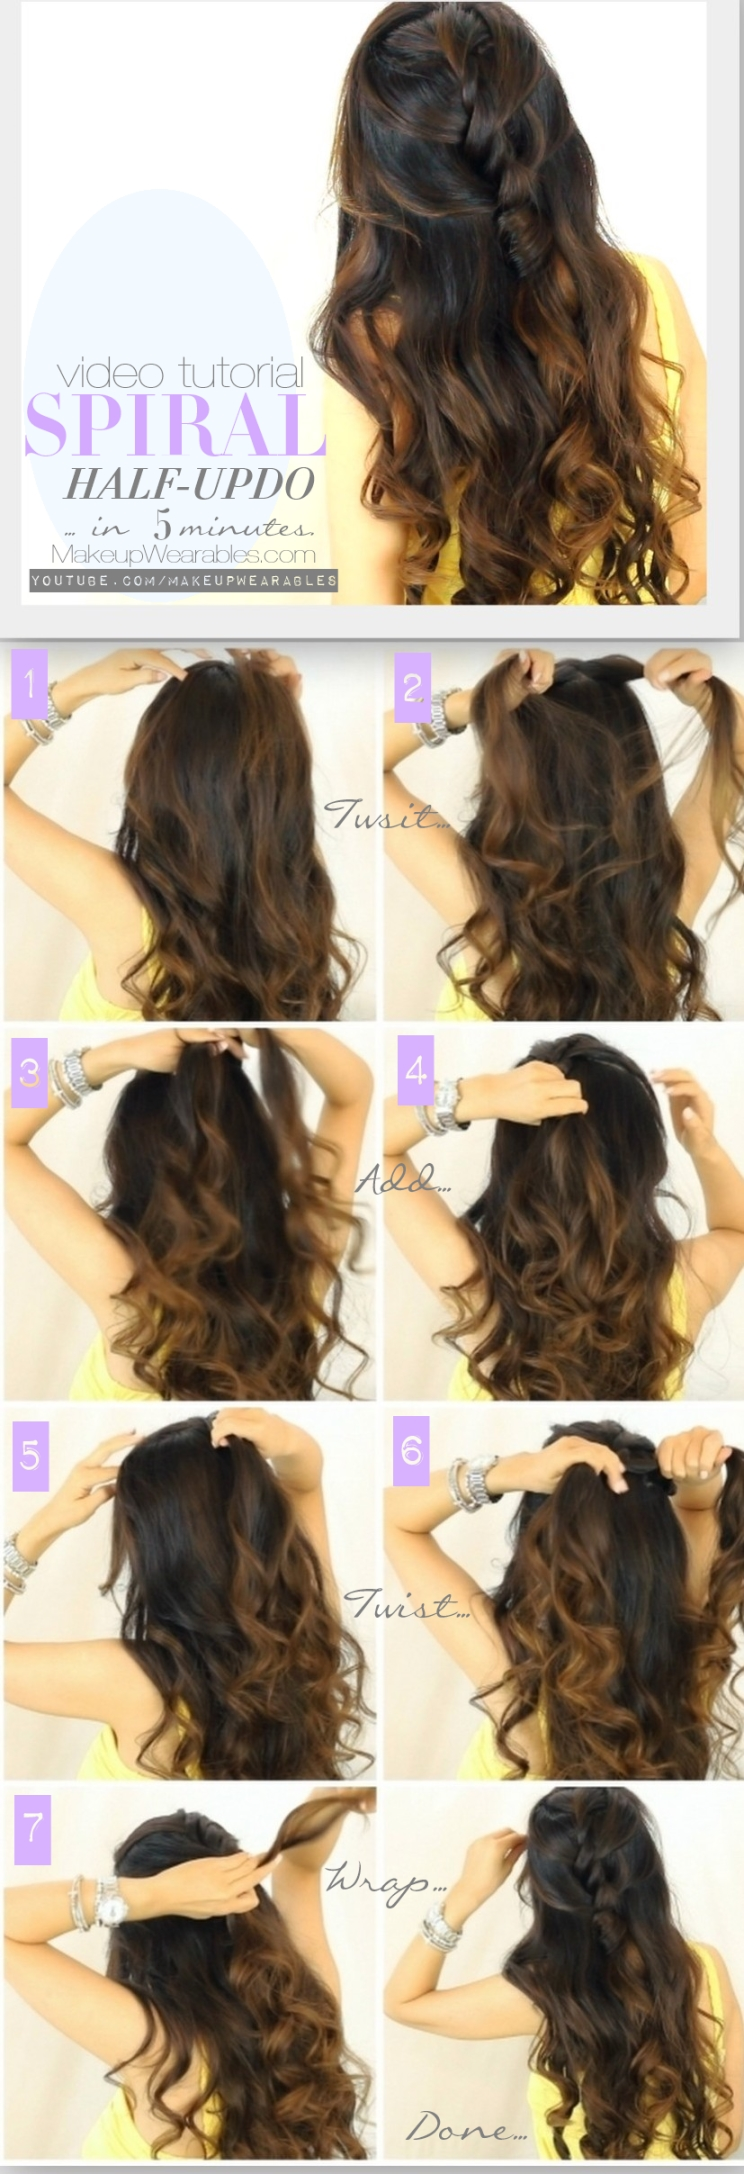 Astonishing 13 Half Up Half Down Hair Tutorials Hairstyles For Women Draintrainus